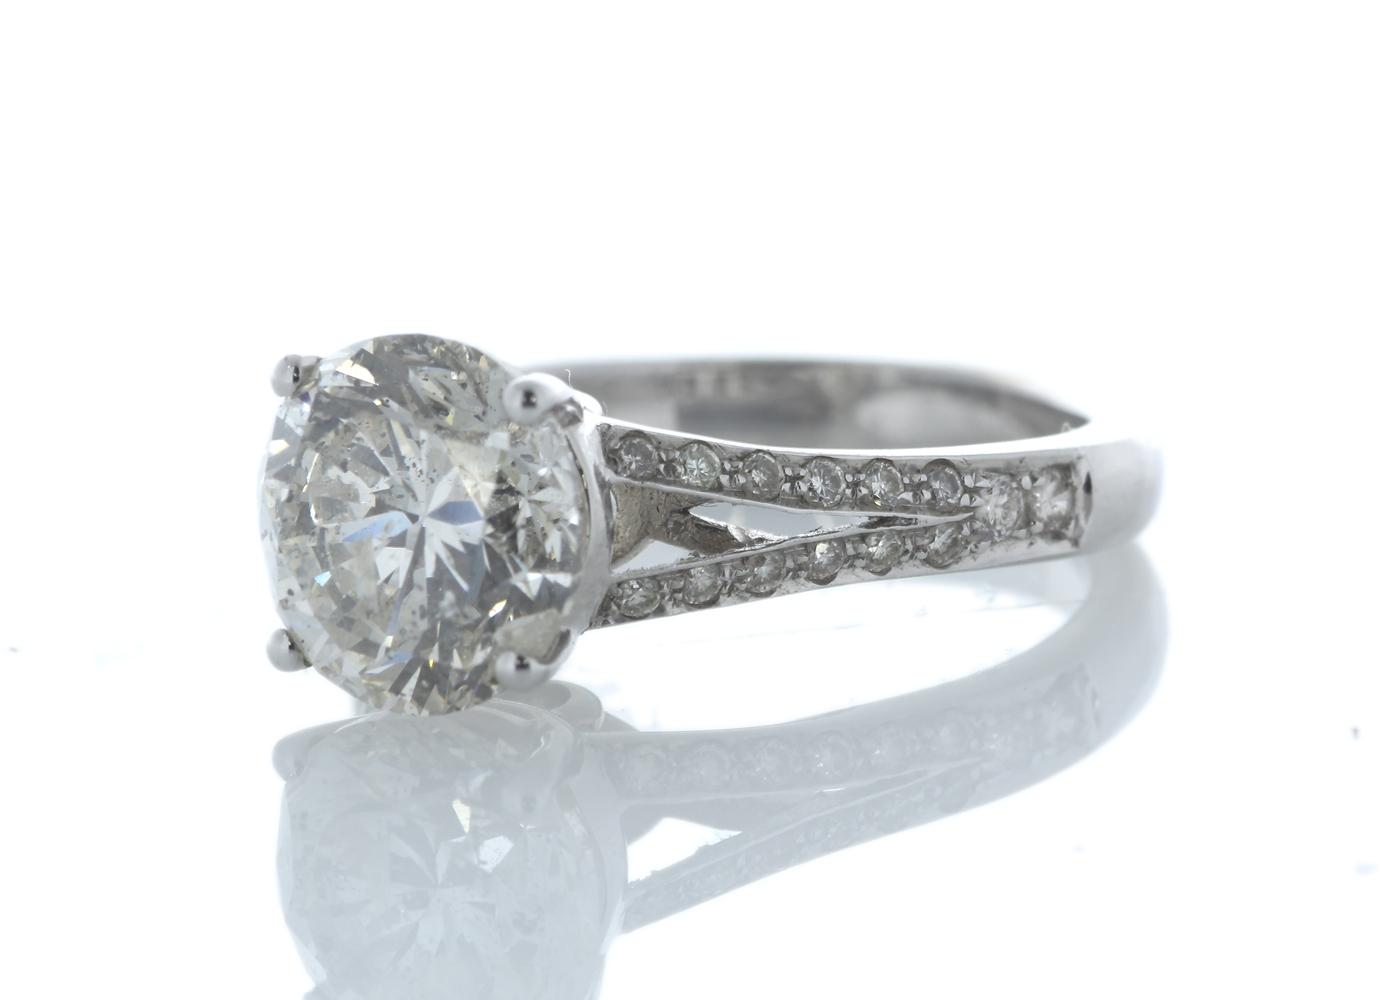 Lot 24 - 18ct White Gold Single Stone Prong Set With Stone Set Shoulders Diamond Ring 3.56 Carats